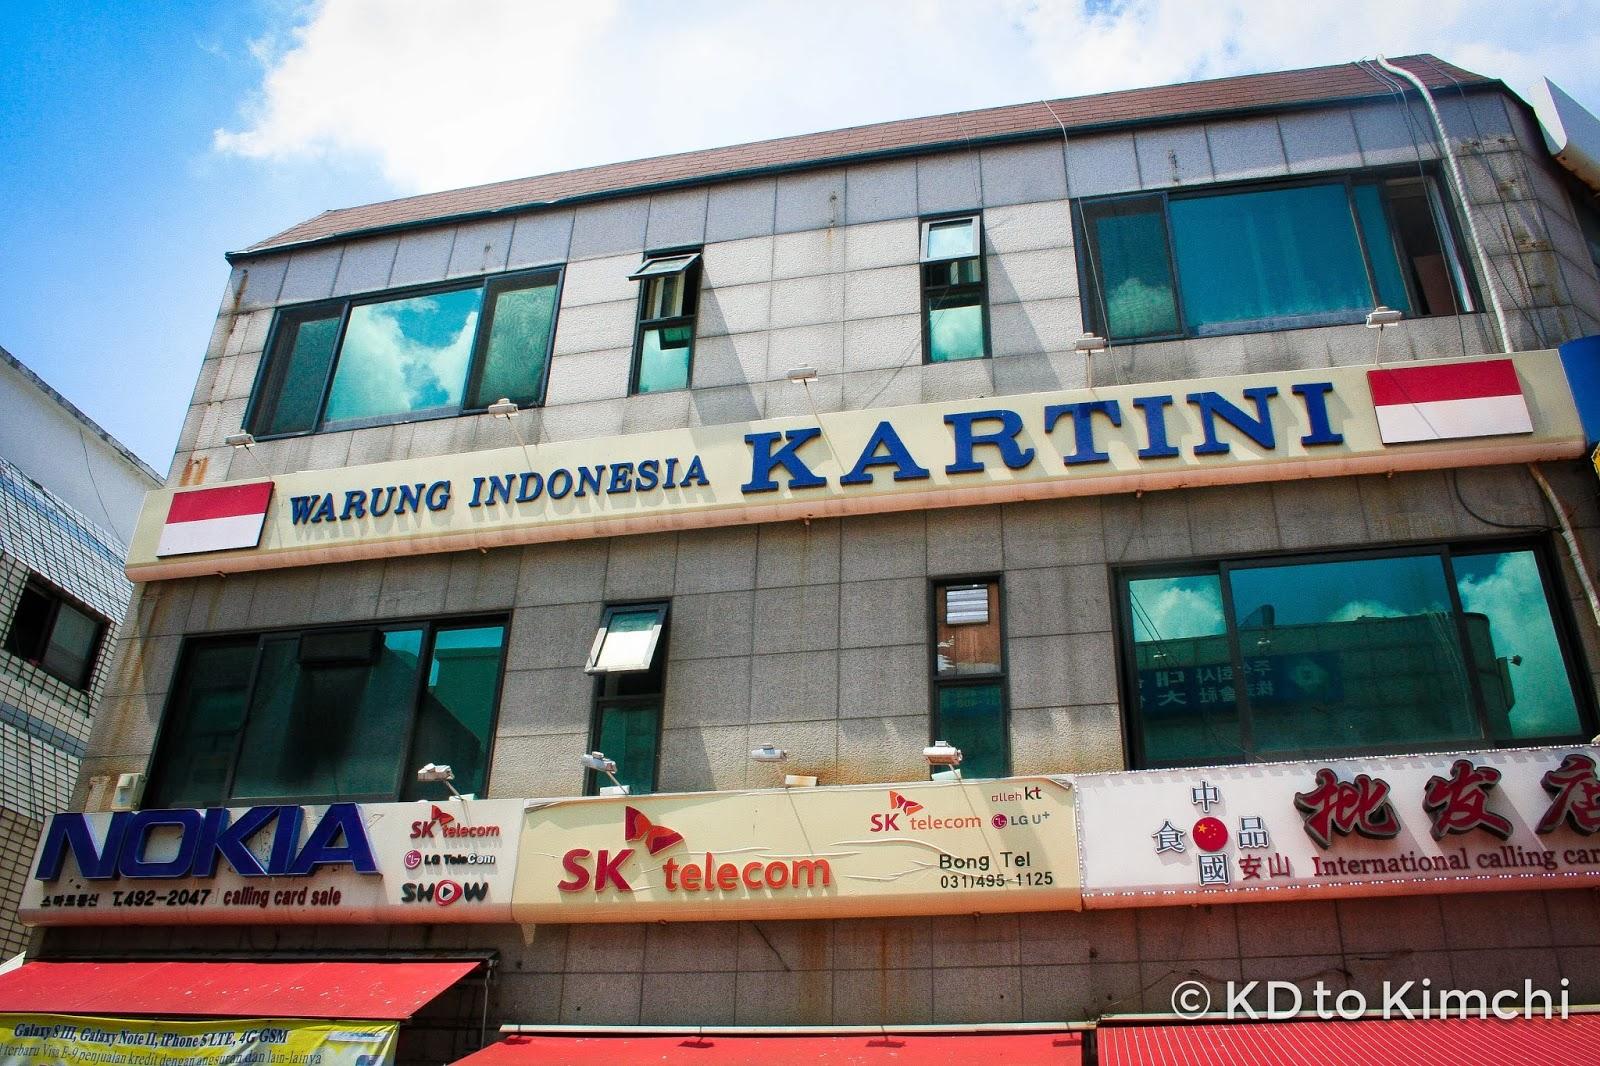 Warung Indonesia Kartini | KDtoKimchi